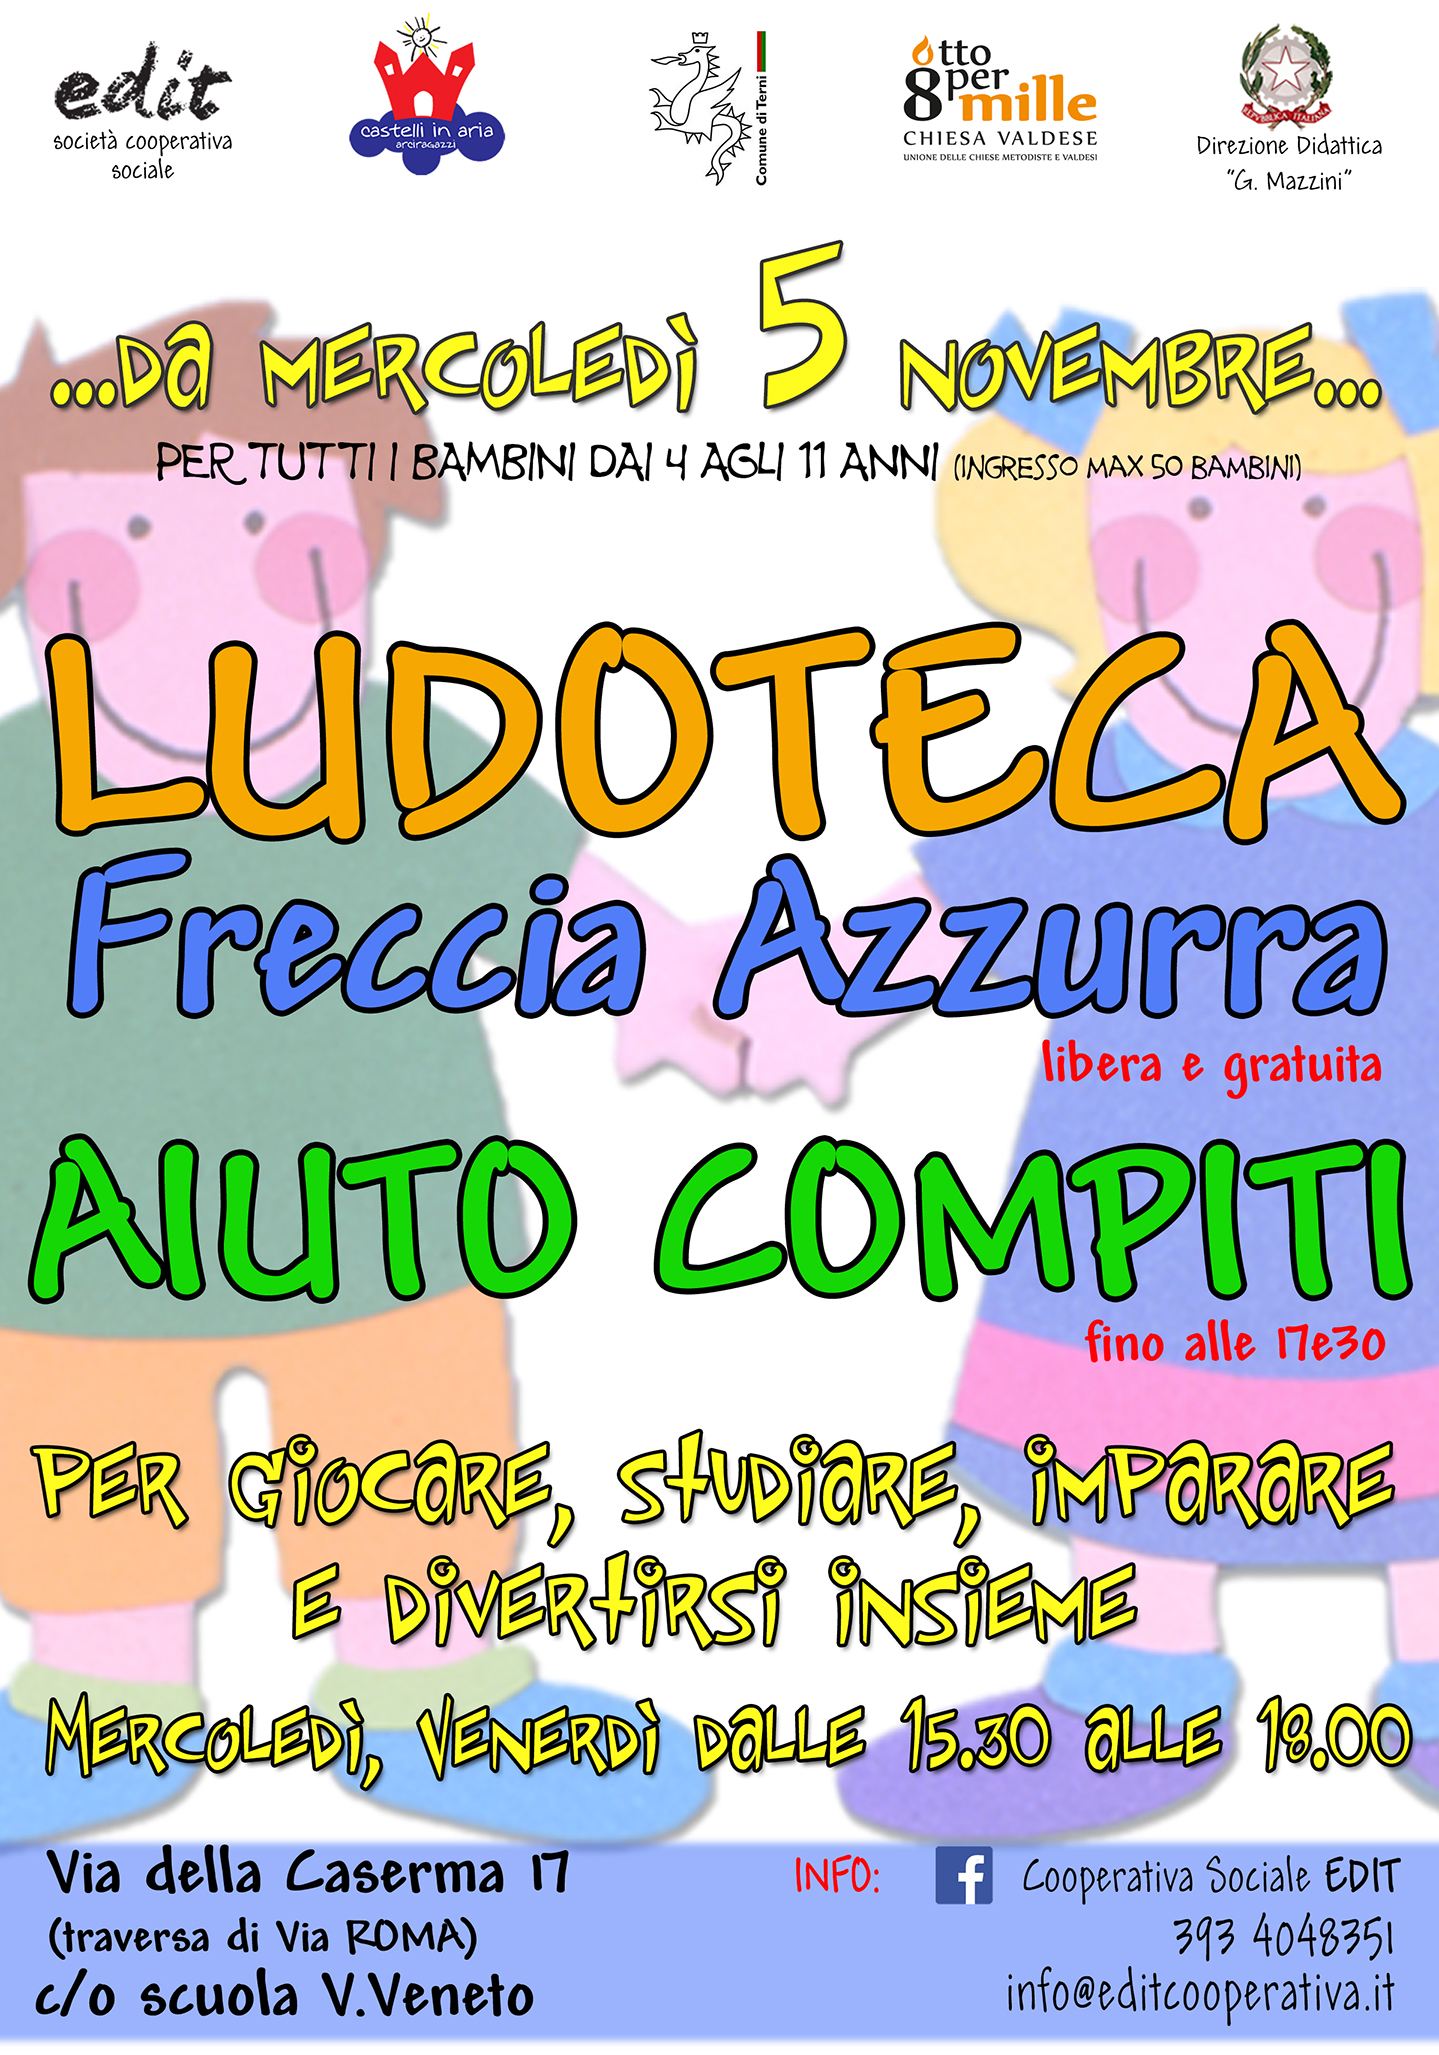 ludoteca-A4-2014-small.jpg